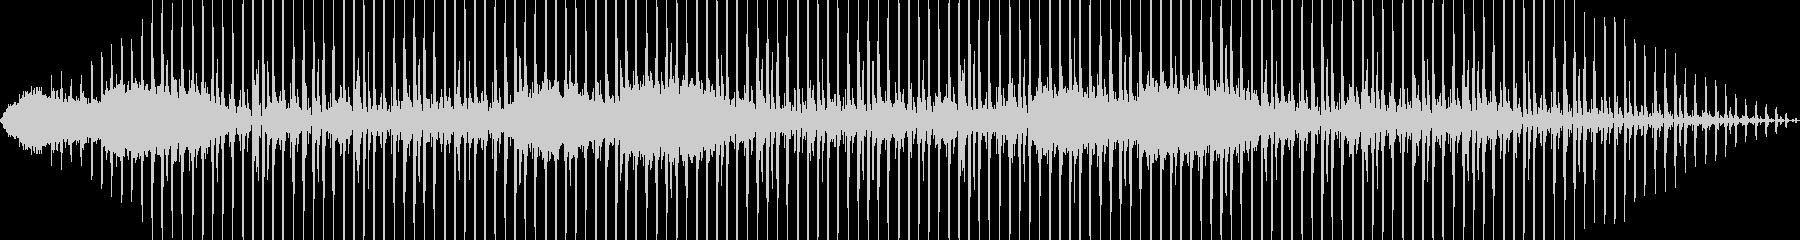 Electro、Instrumen...の未再生の波形